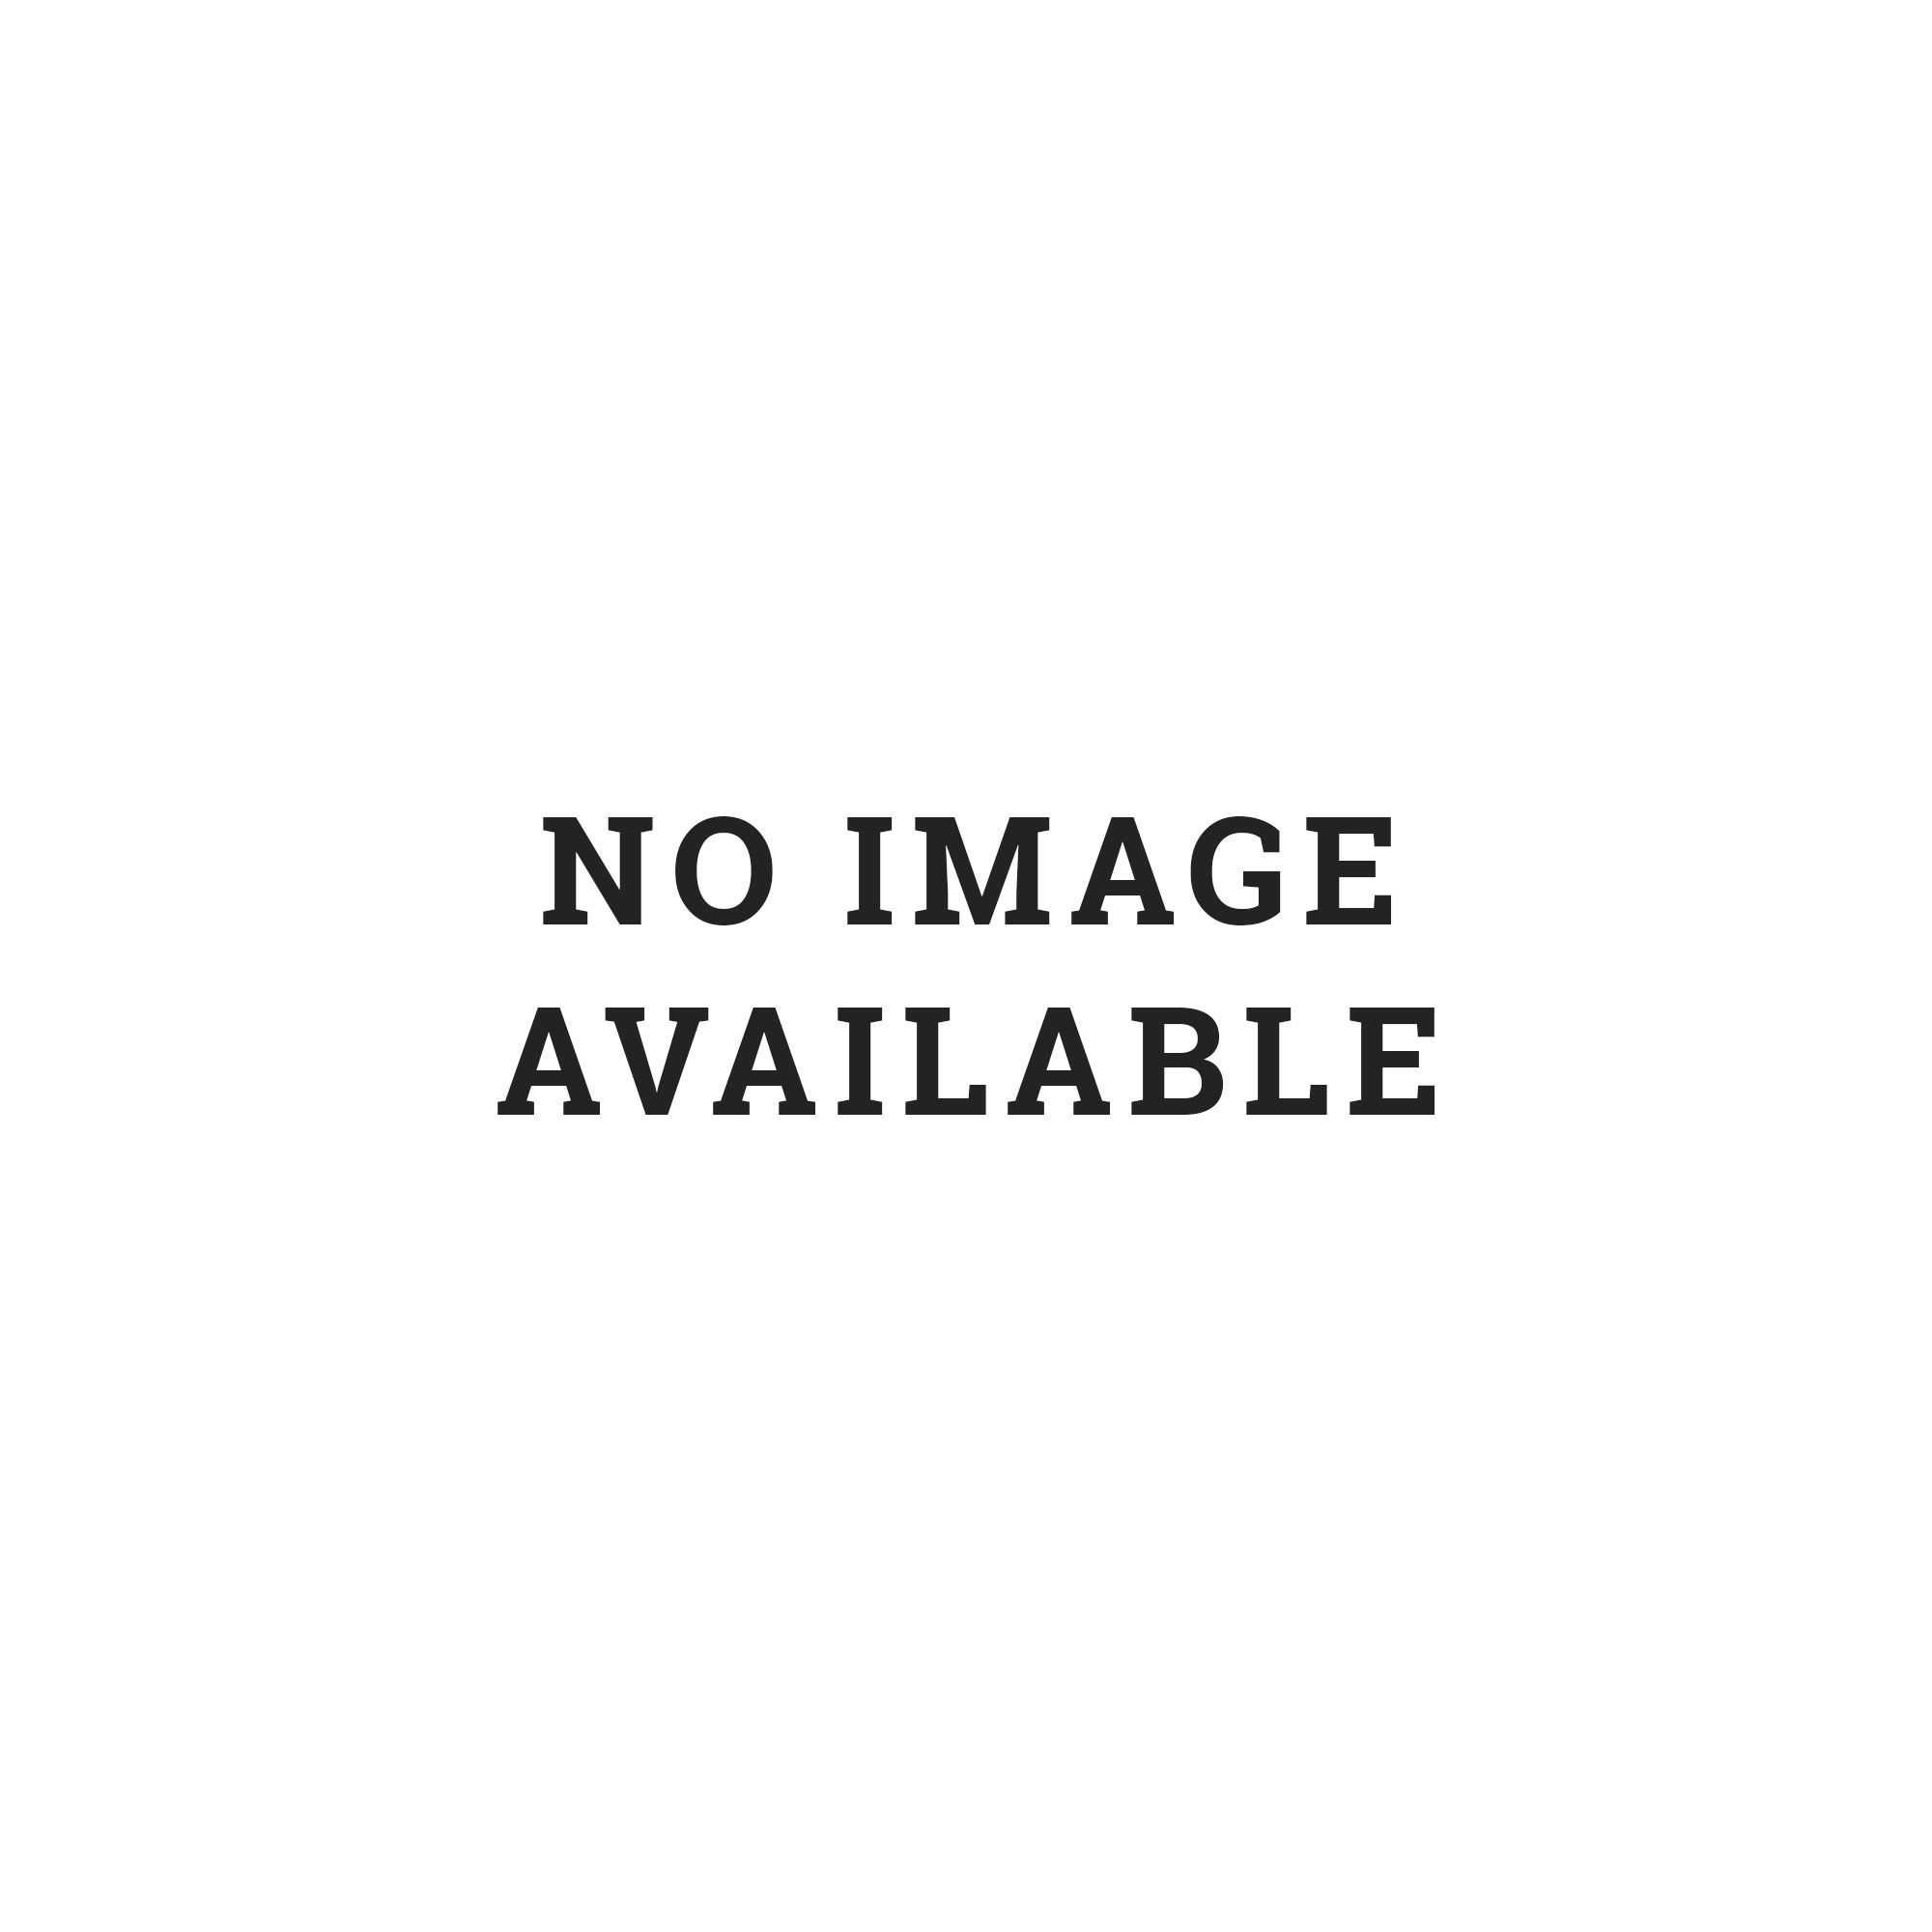 03d5c2ce818e 549584C Chuck Taylor All Star Brea Womens Leather Hi-Top Shoes - Deep  Bordeau